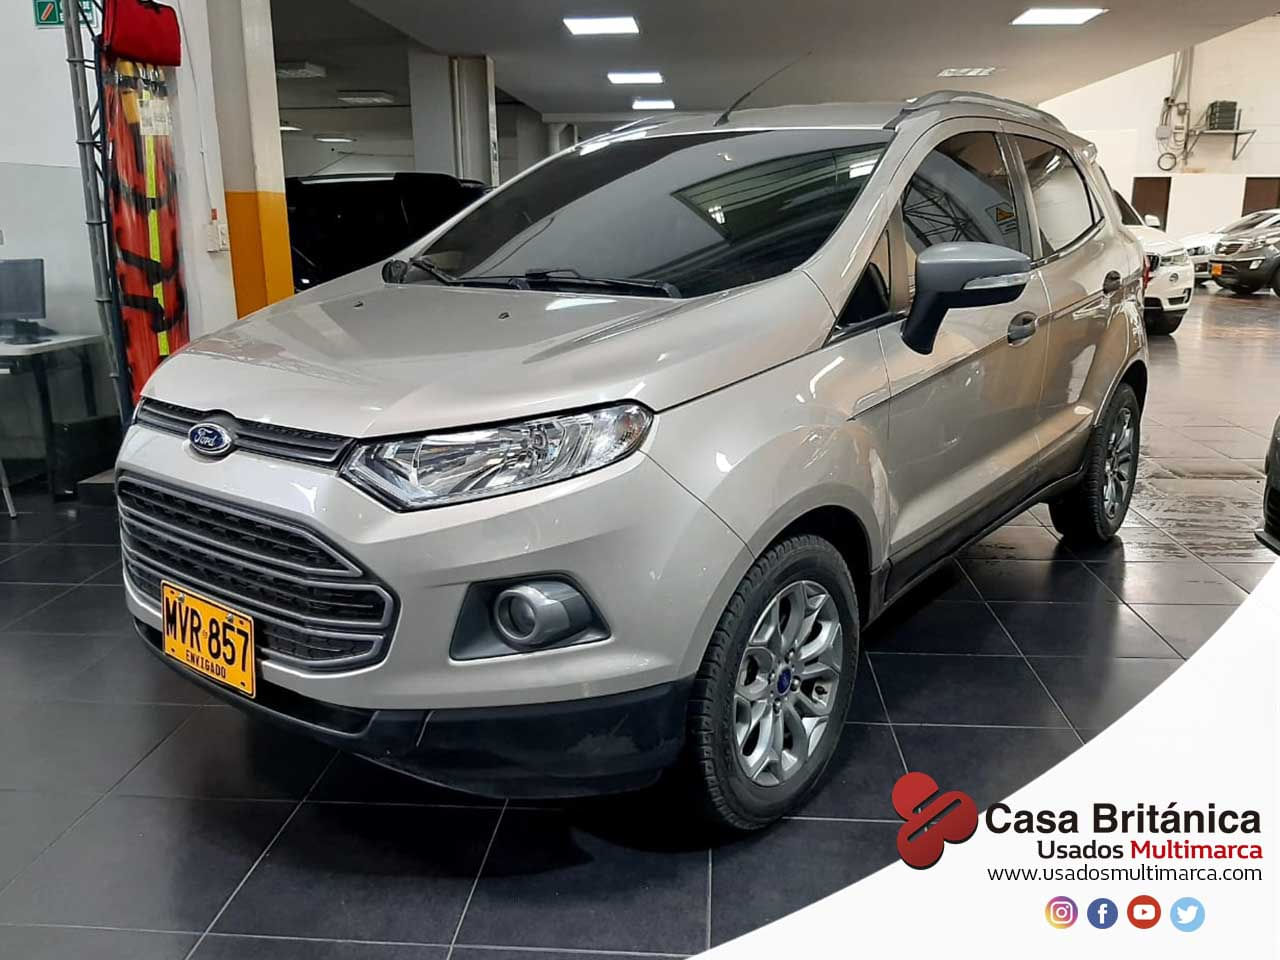 Ford-Ecosport-01473737-1